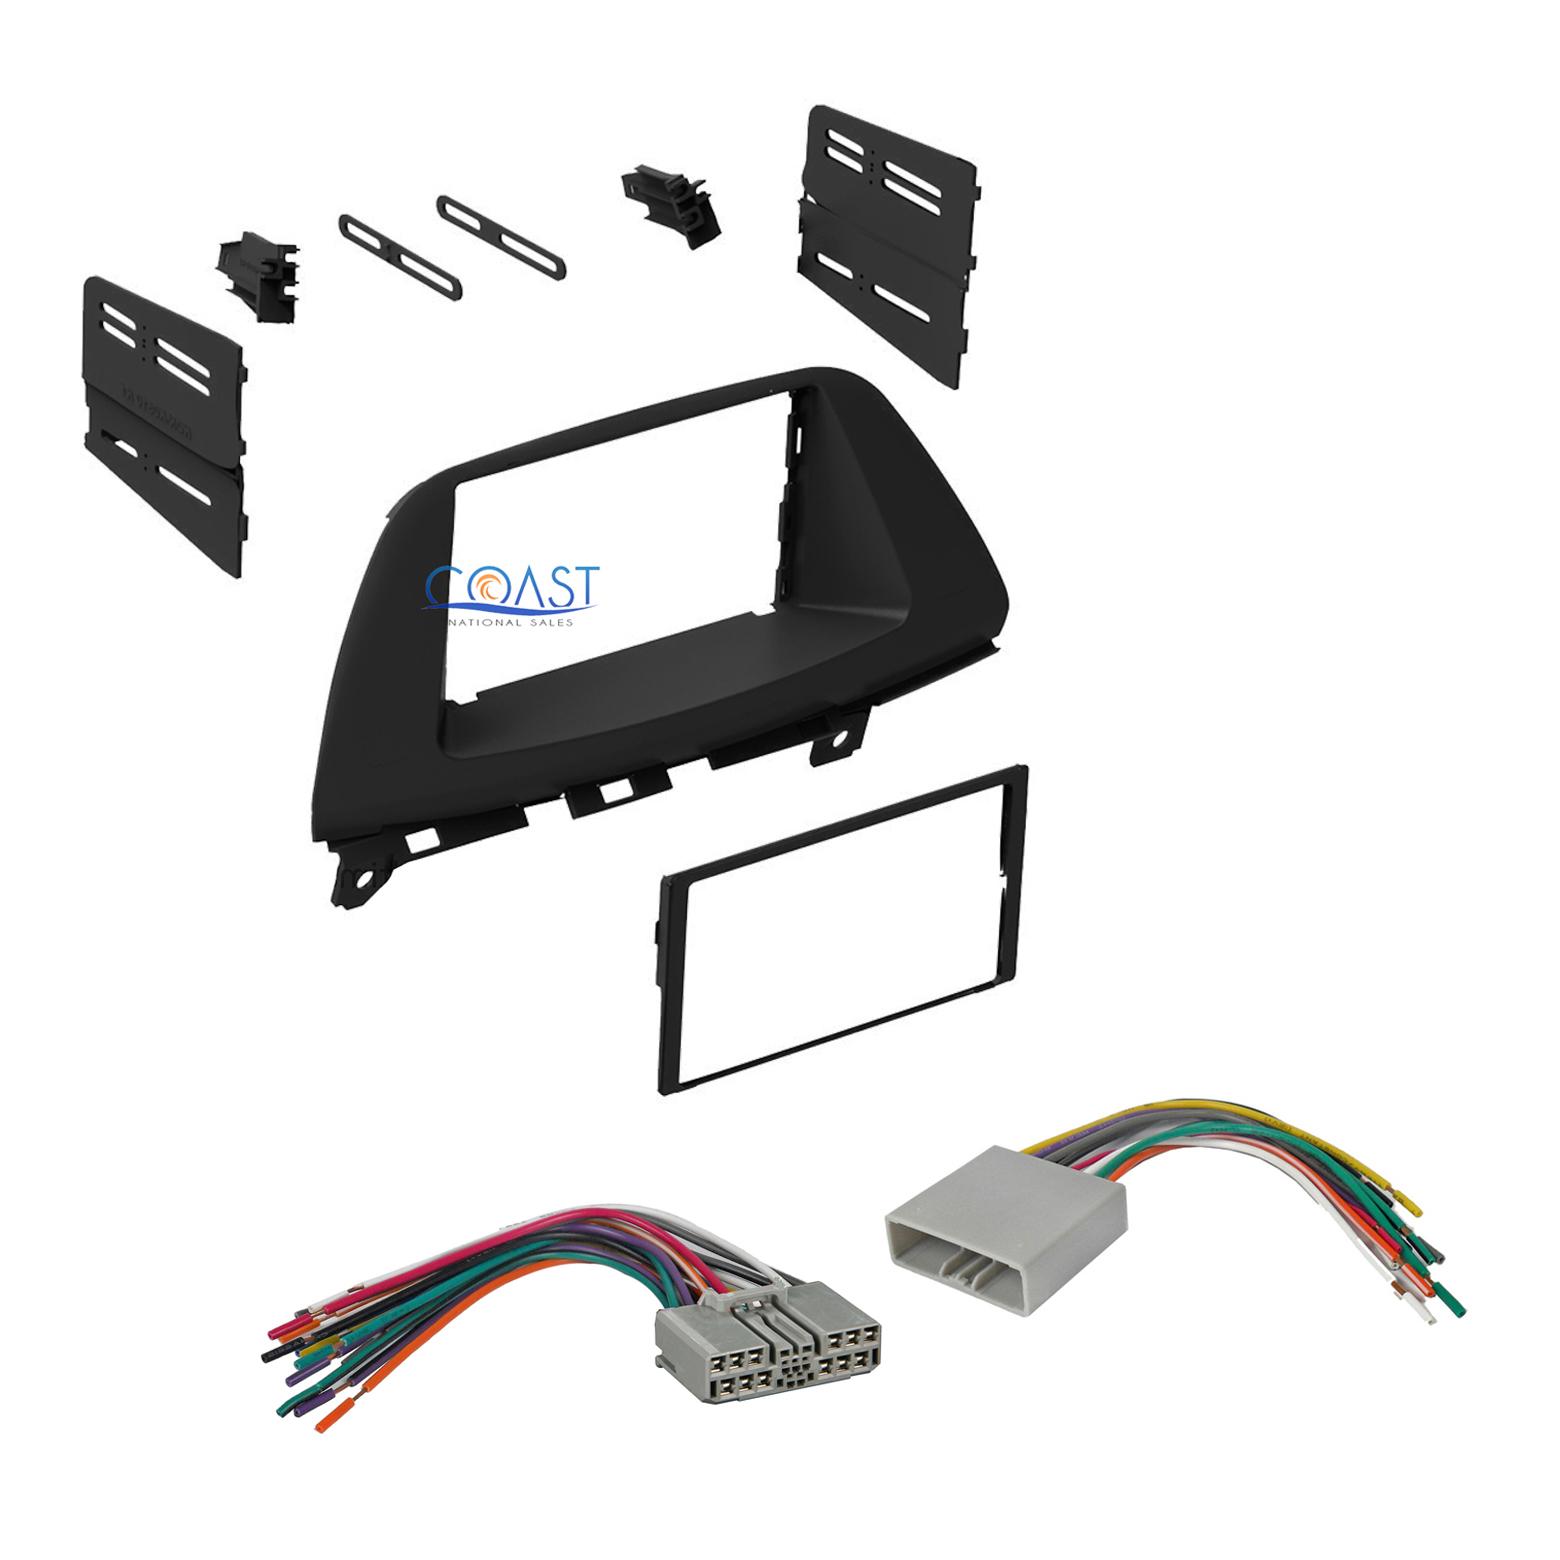 Single Double DIN Car Stereo Dash Kit Harness for 2008-2010 Honda Odyssey